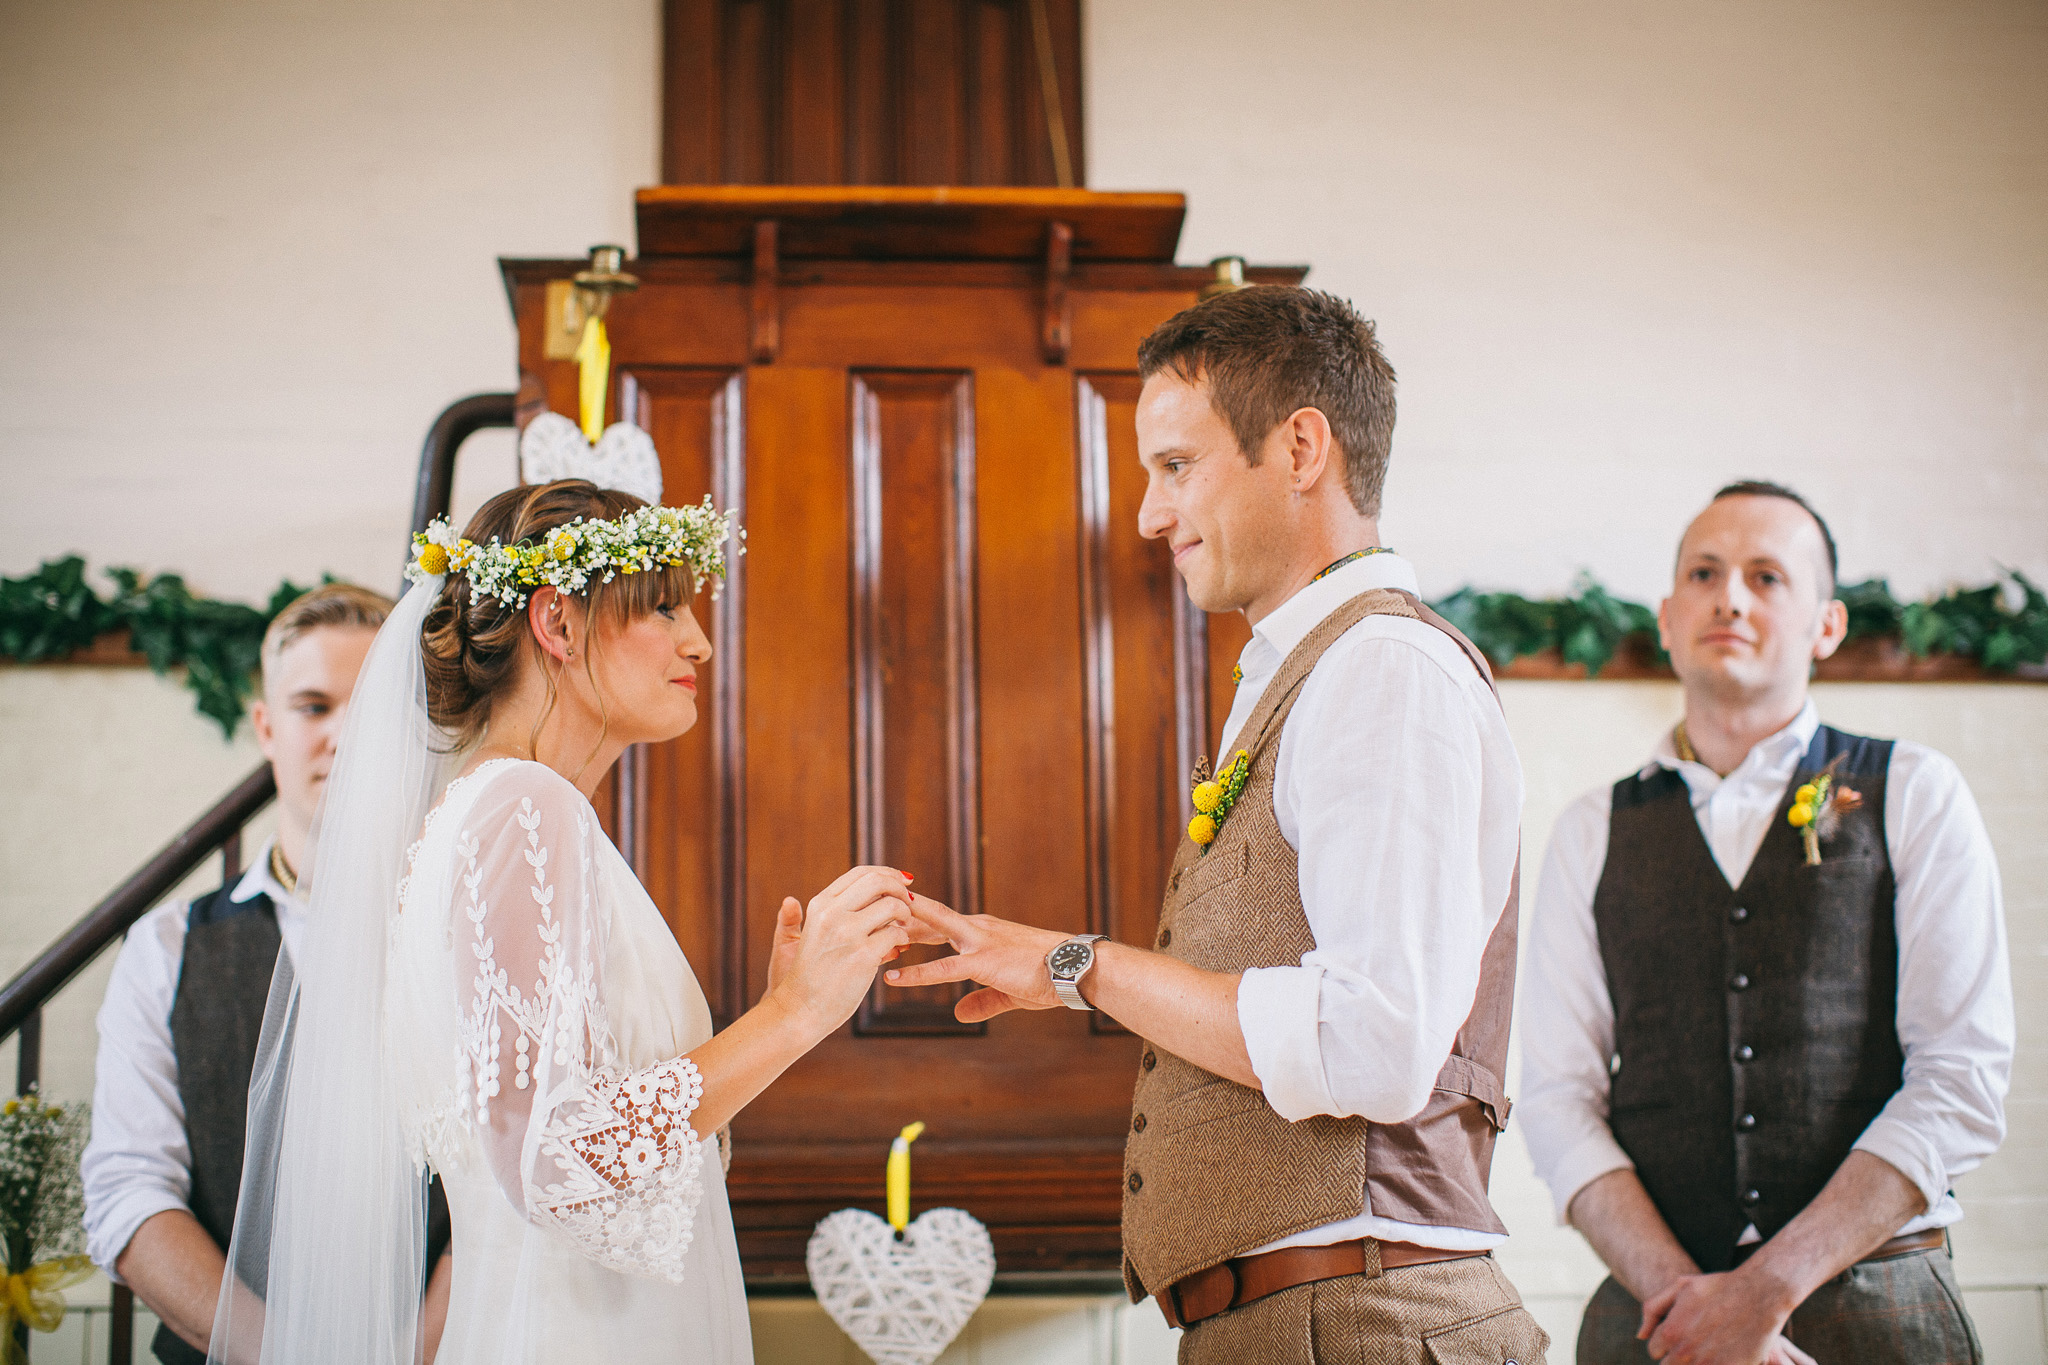 chantry_sussex_barn_wedding_315.jpg